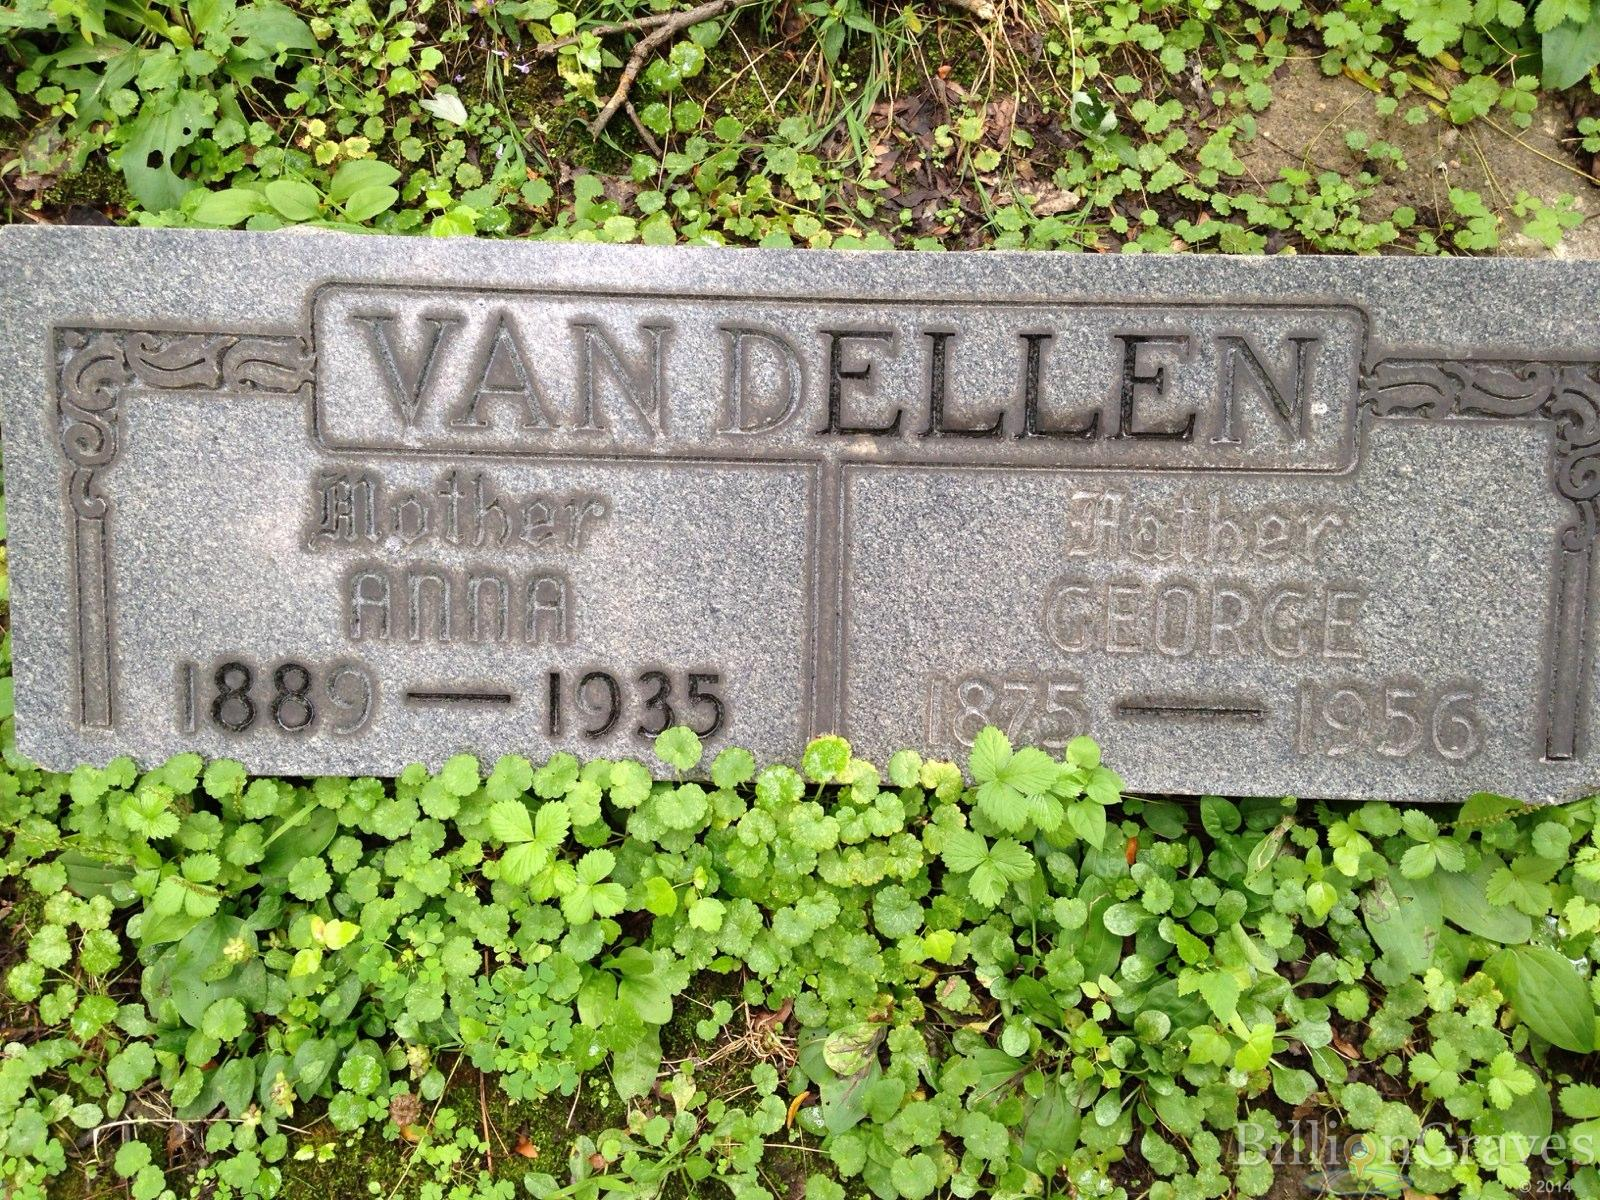 grave site of george van dellen 1875 1956 billiongraves headstone image of george van dellen